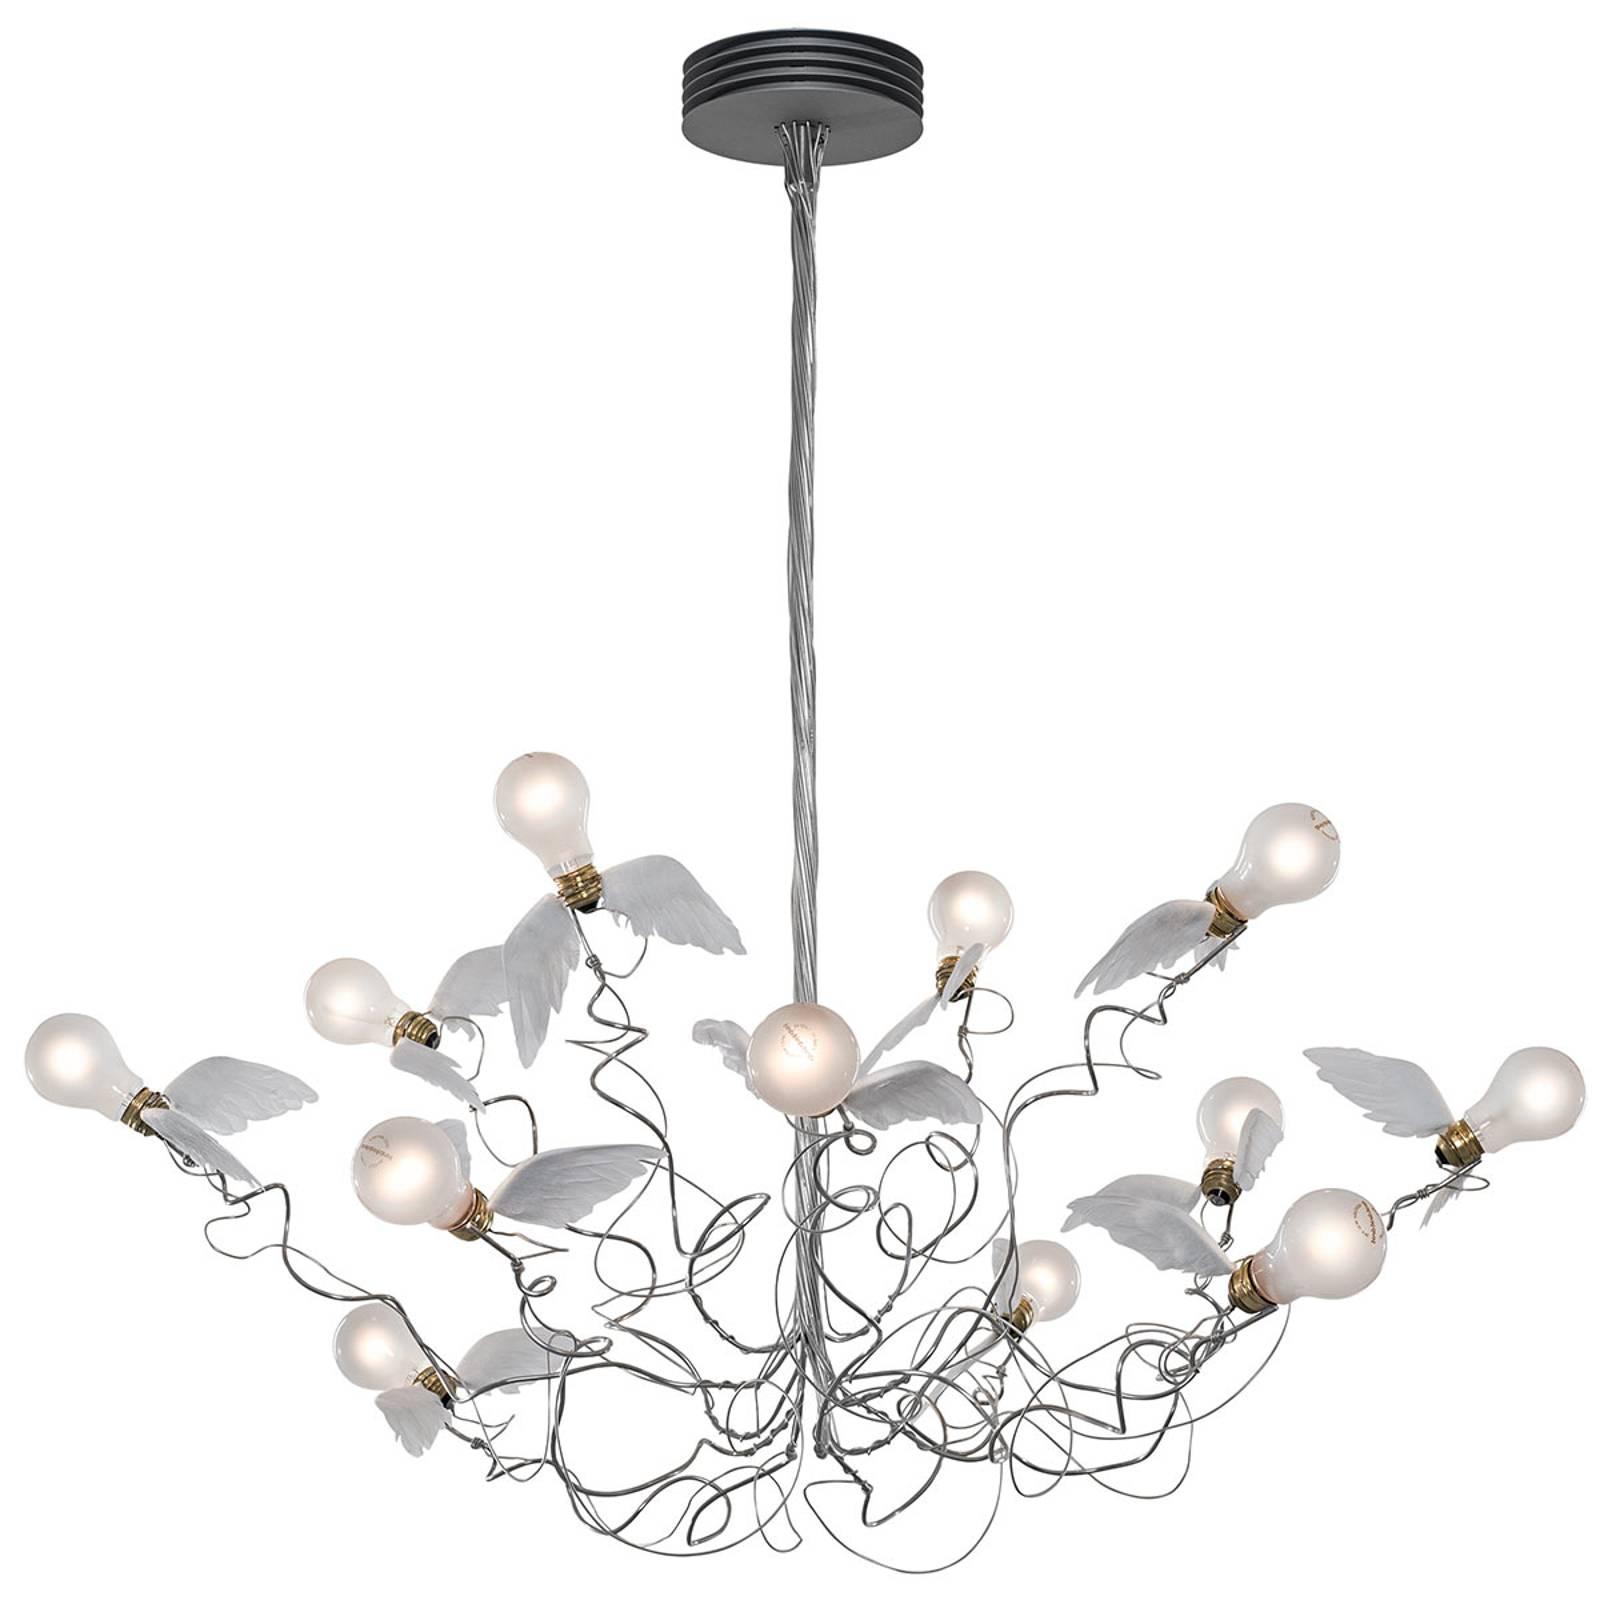 Ingo Maurer Birdie -LED-riippuvalo, kirkas johto